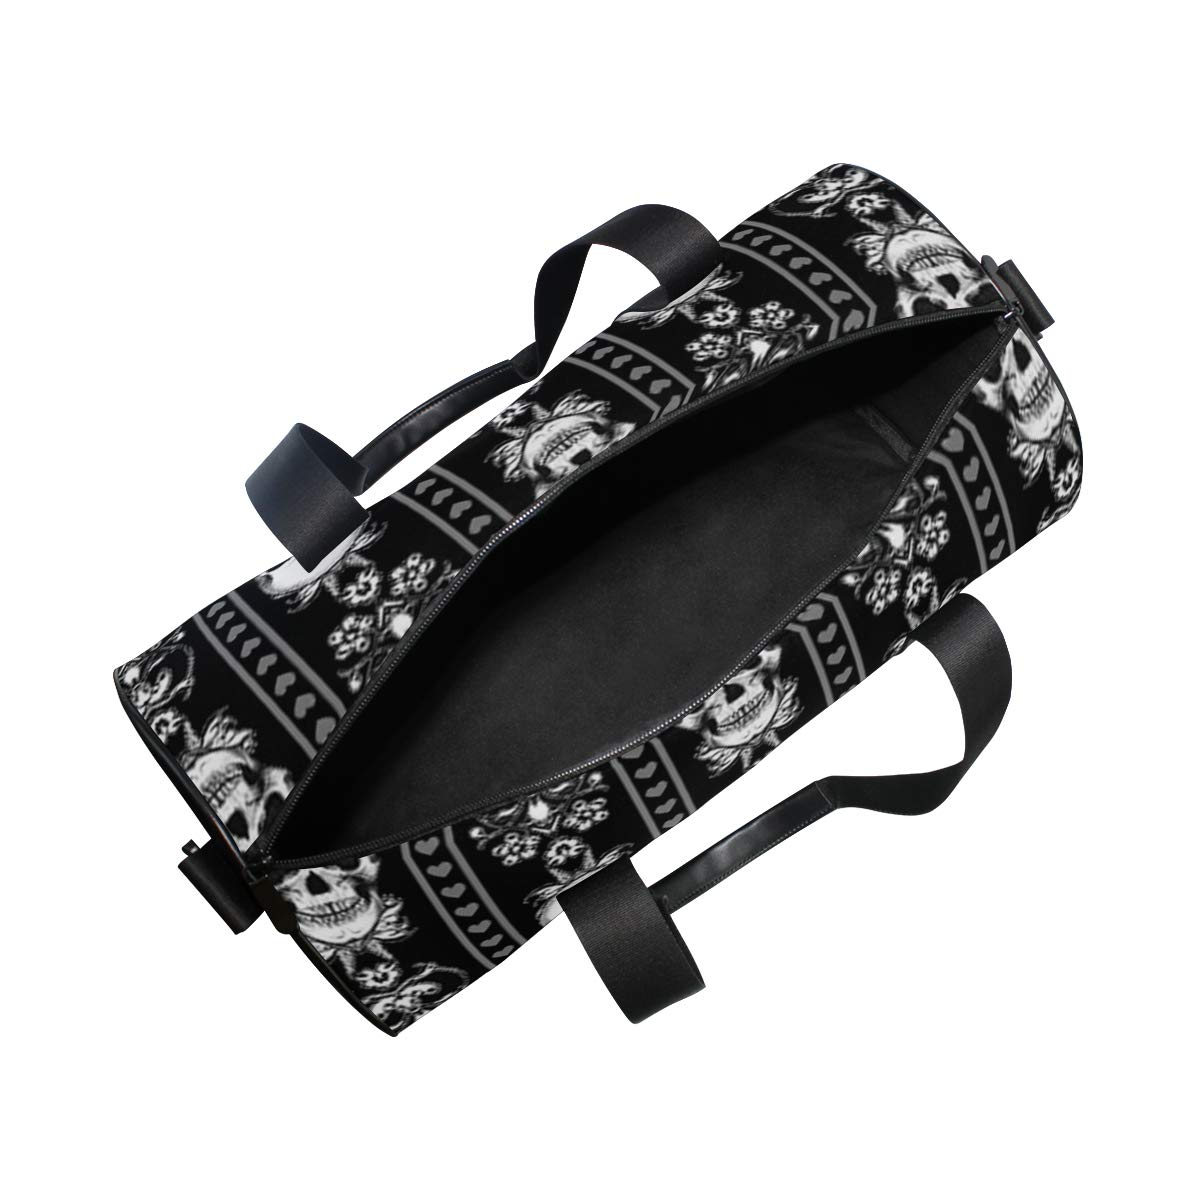 Sports Gym Duffel Barrel Bag Baroque Skull Stripe Gothic Black Travel Luggage Handbag for Men Women